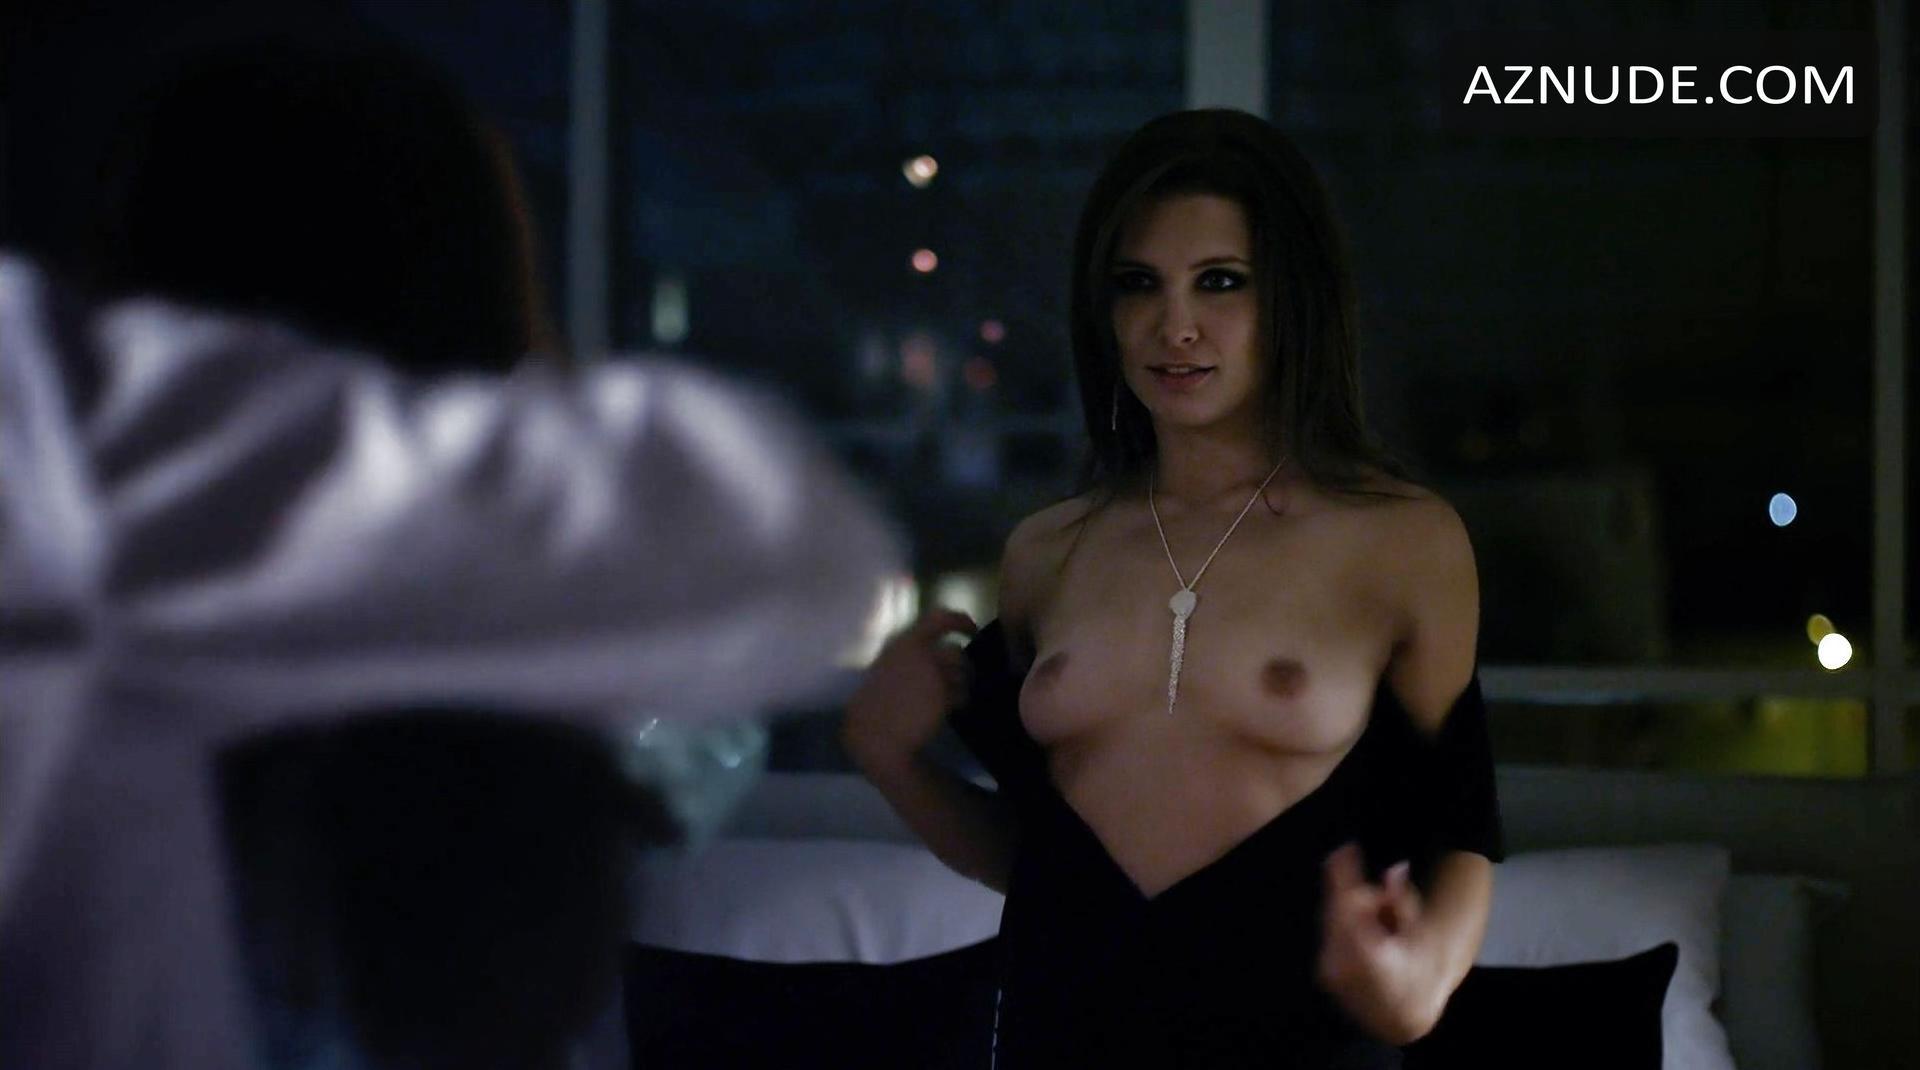 Charlize Theron Nude Sex Scene In The Devils Advocate